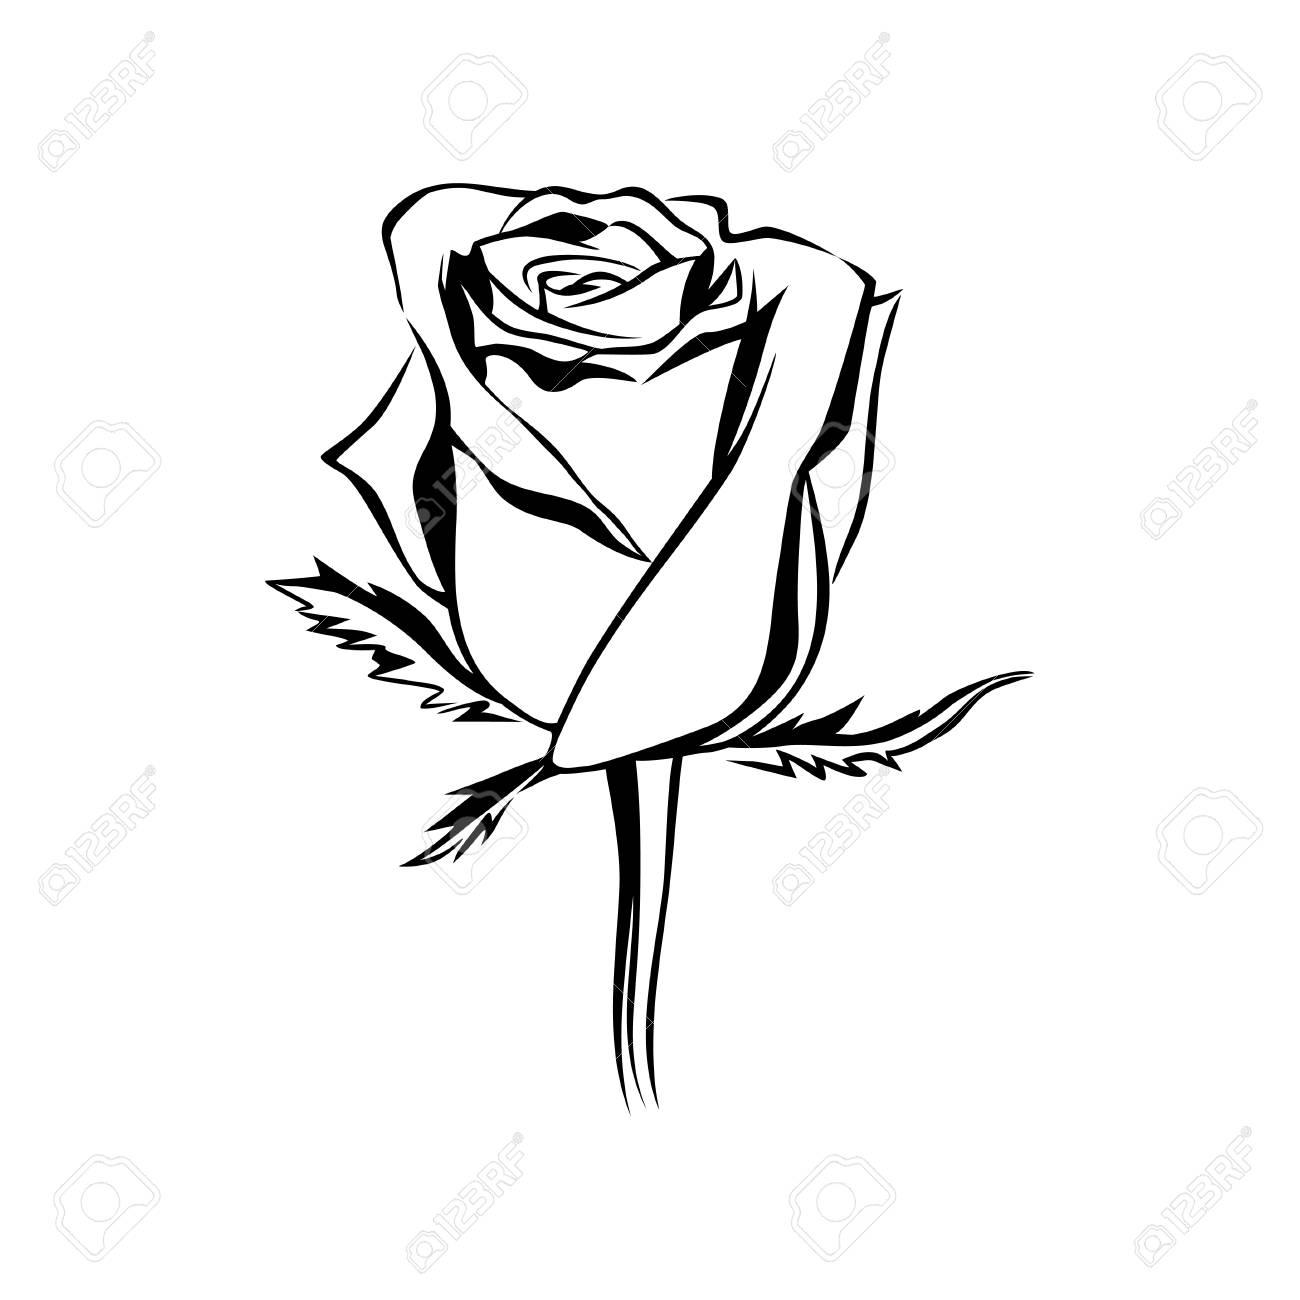 Vector Rose Bud Outline Silhouette Logo Tattoo Or Emblem Of